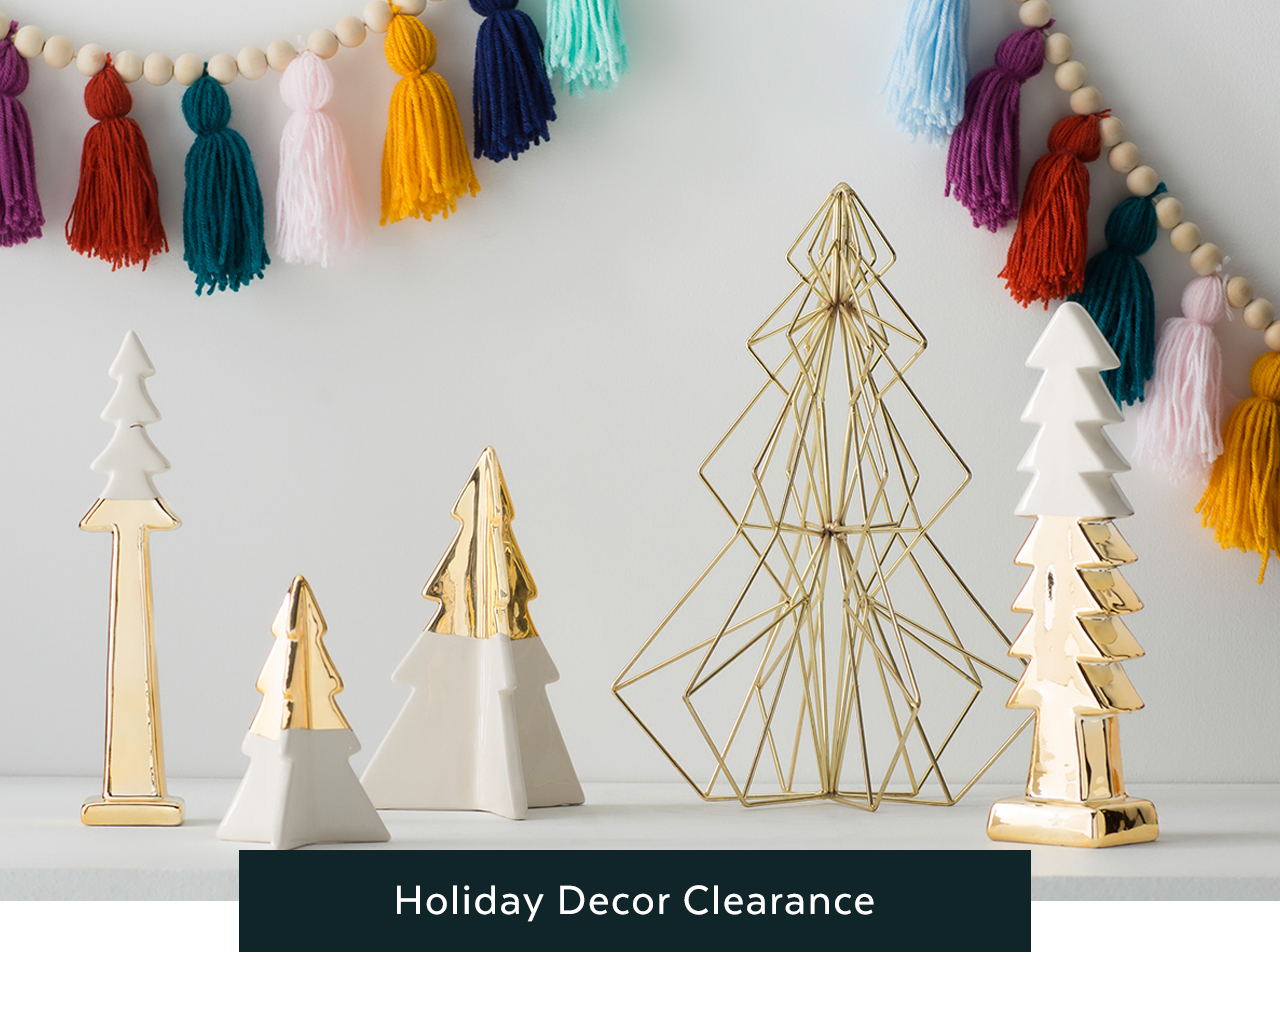 Holiday Decor Clearance